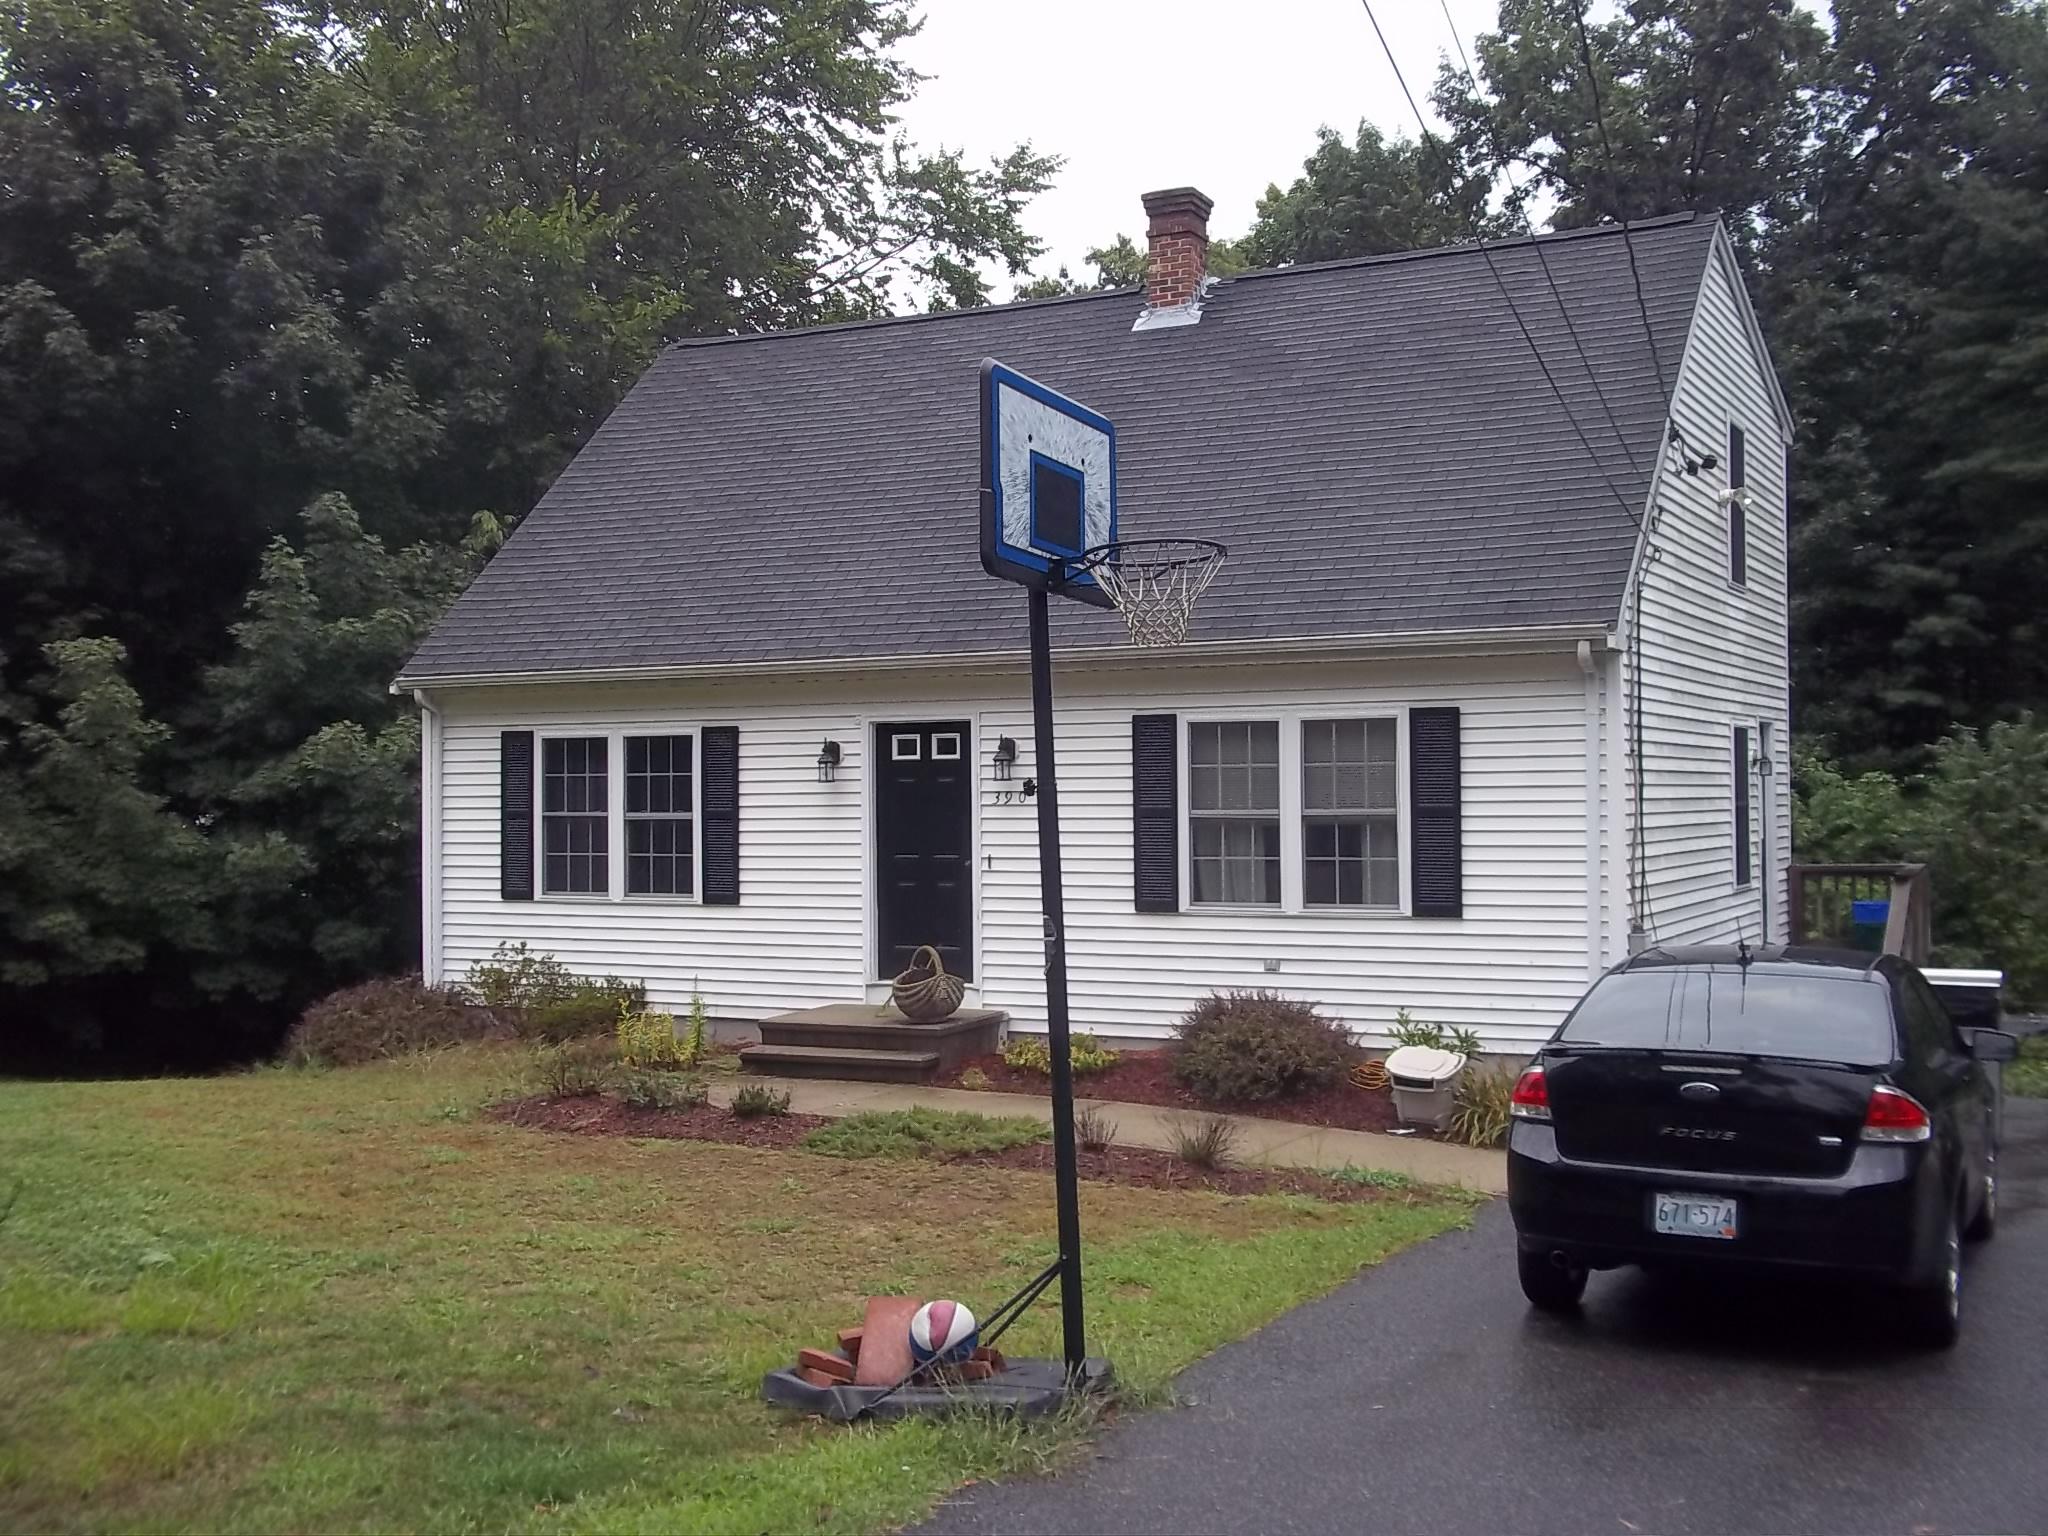 Burillville, RI - Closed August 18, 2017